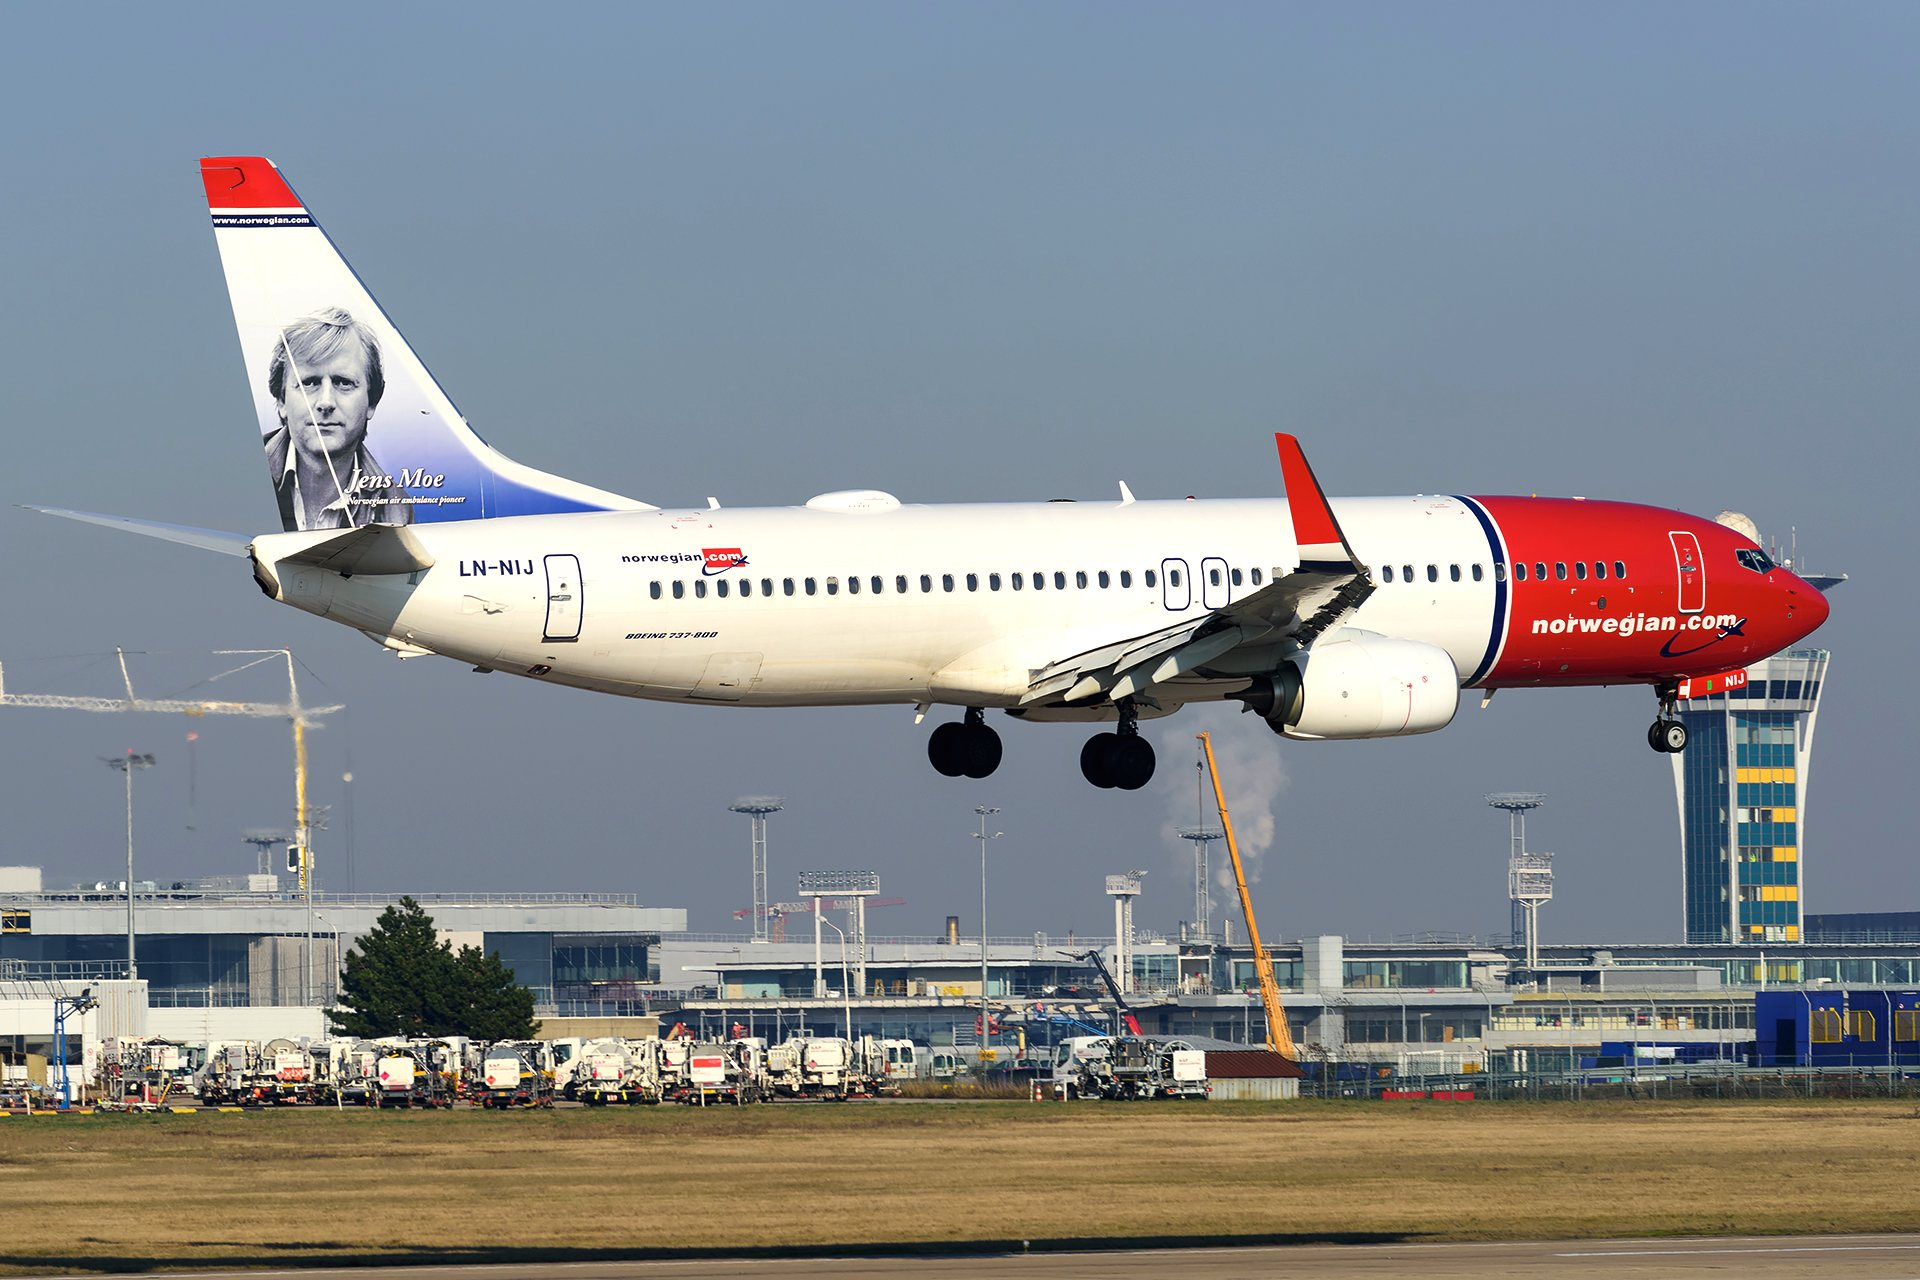 Boeing 737-800 Norwegian LN-NIJ © Guillaume Février - reproduction interdite